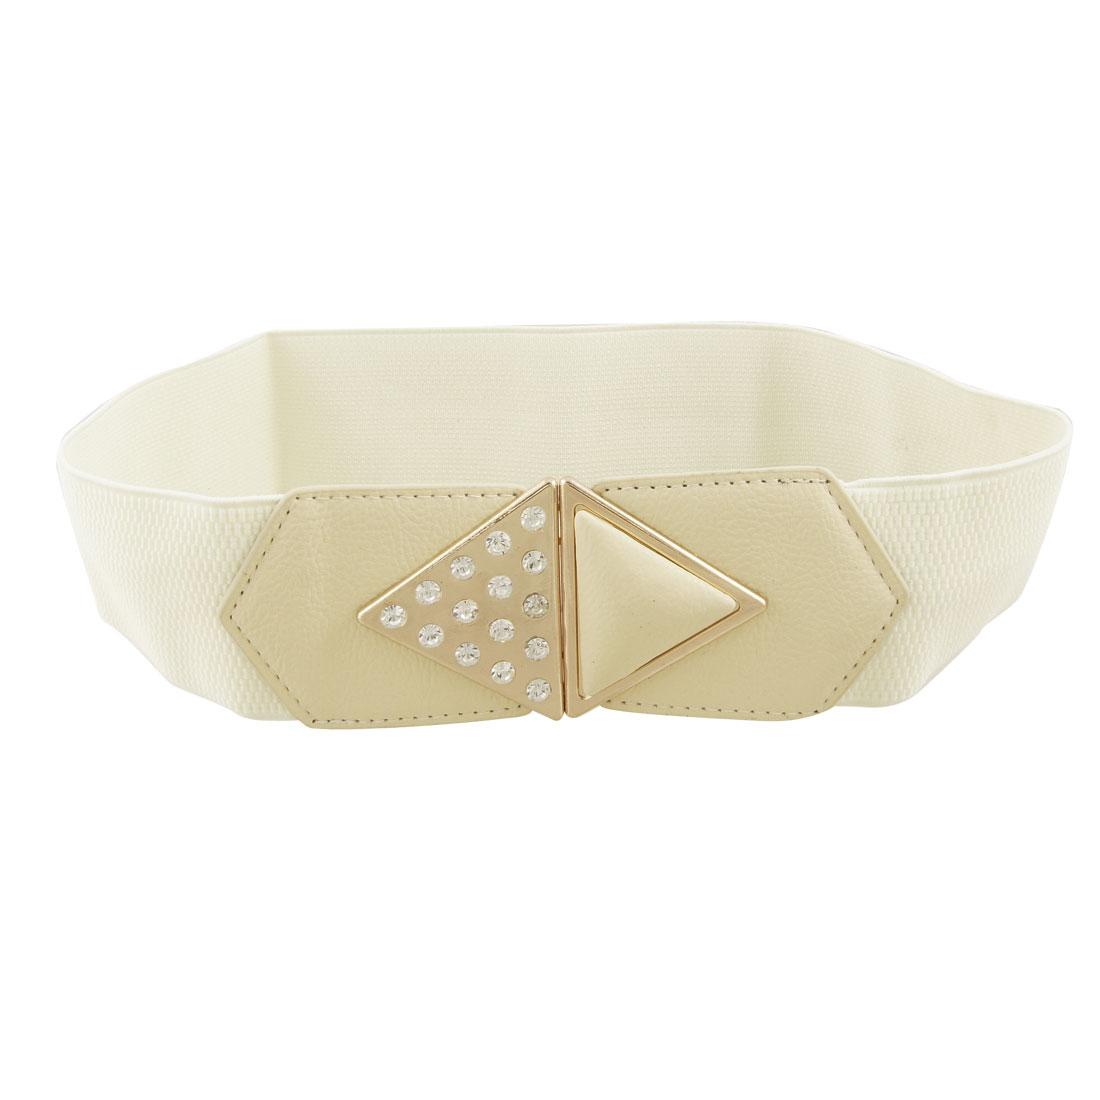 Woman Rhinestone Inlaid Gold Tone Buckle Beige Elastic Cinch Belt